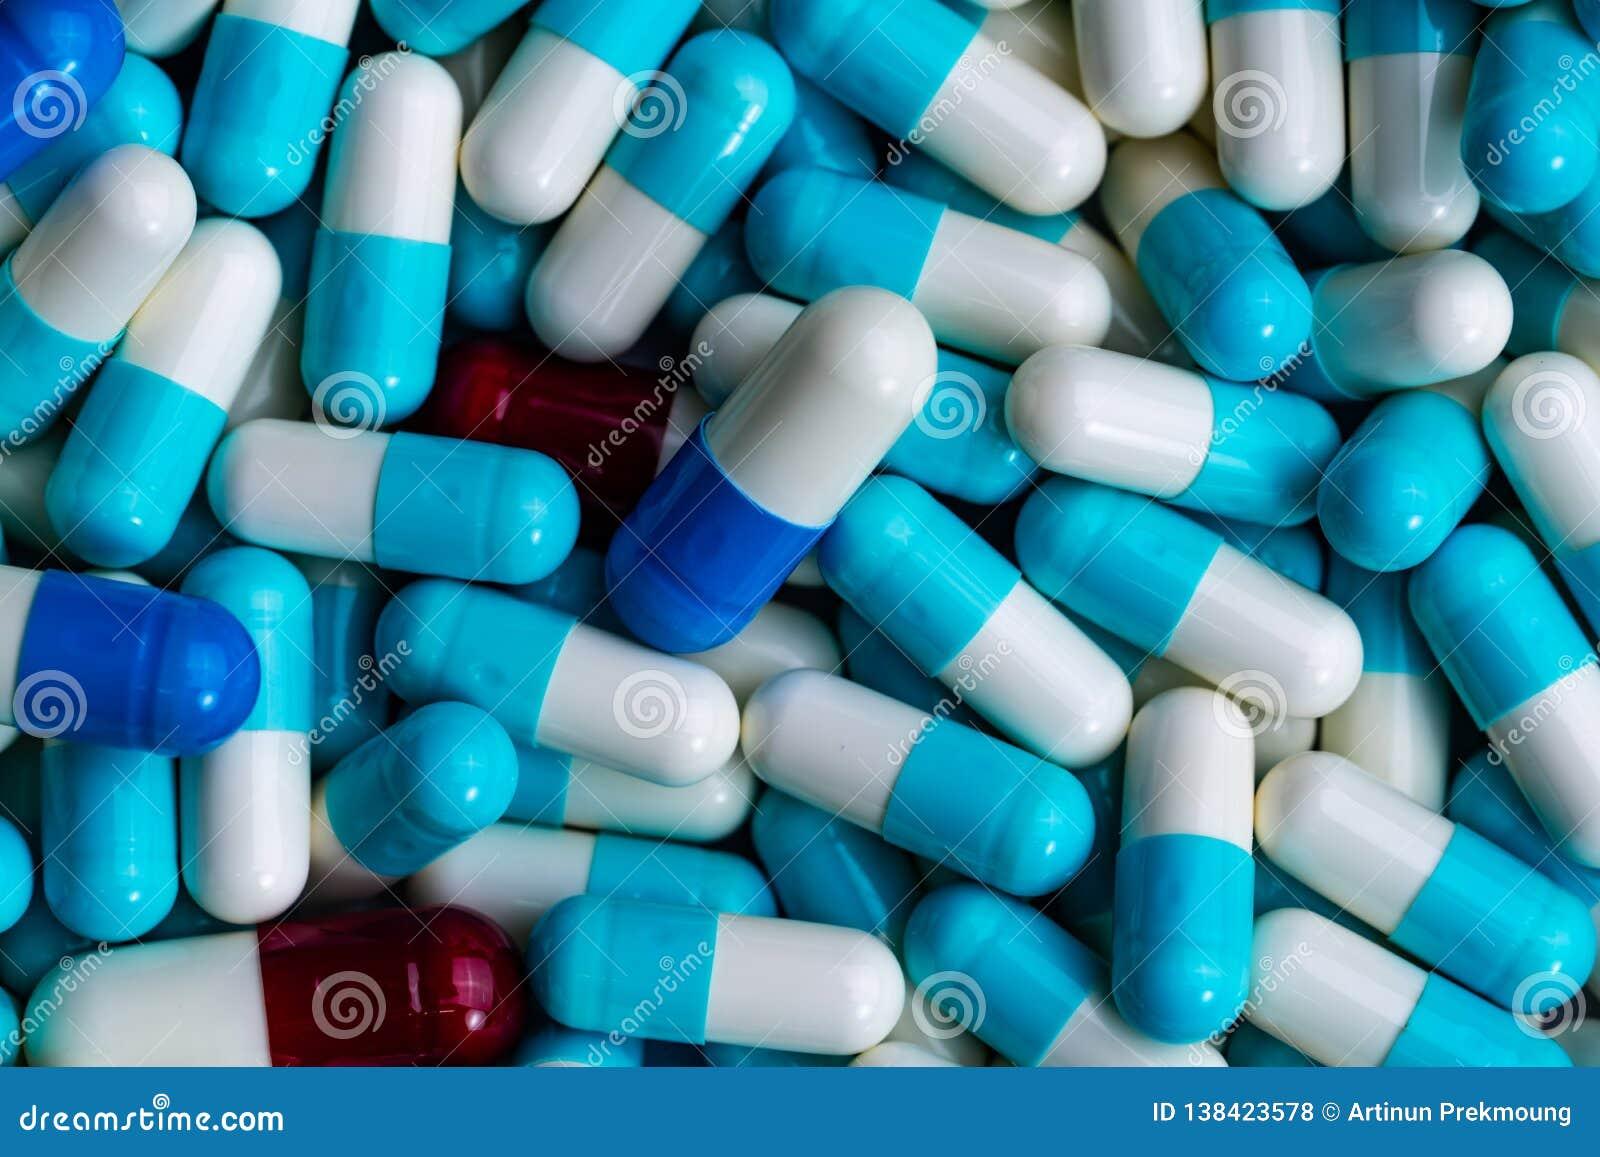 Pile of antibiotic capsule pills. Antibiotics drug resistance. Drug use with reasonable. Global healthcare concept. Antimicrobial